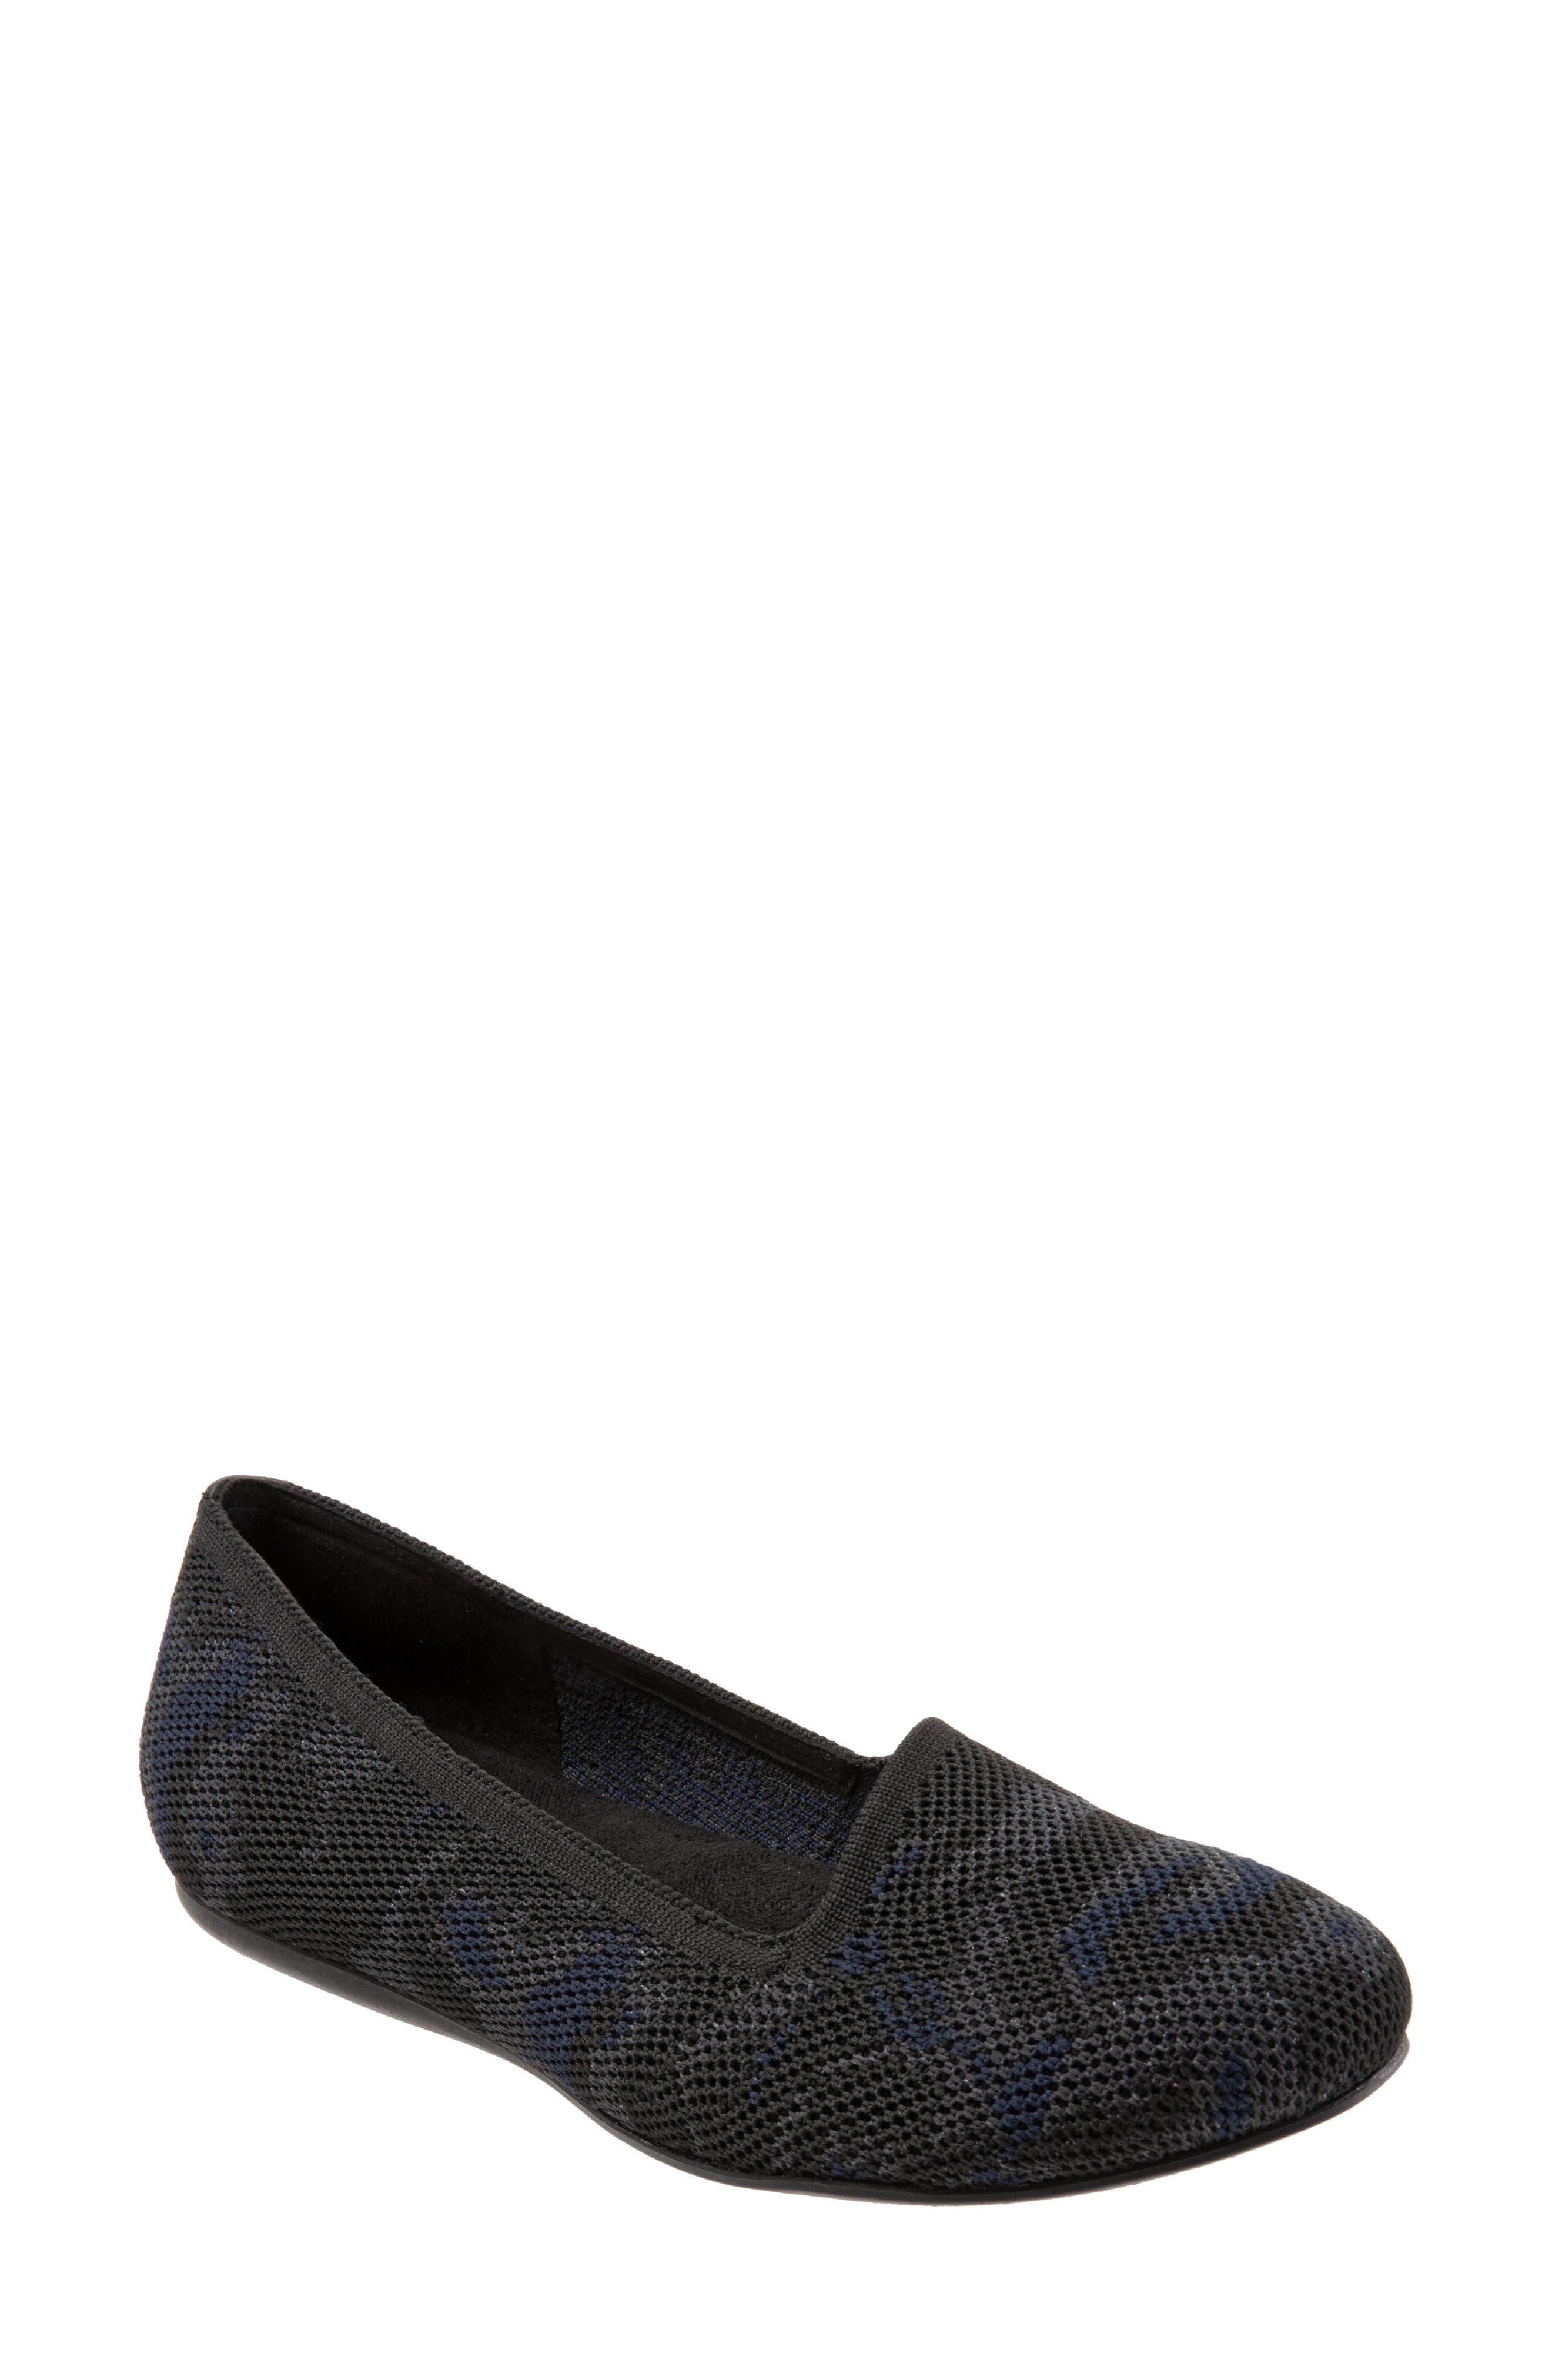 Softwalk Sicily Knit Flat, Black